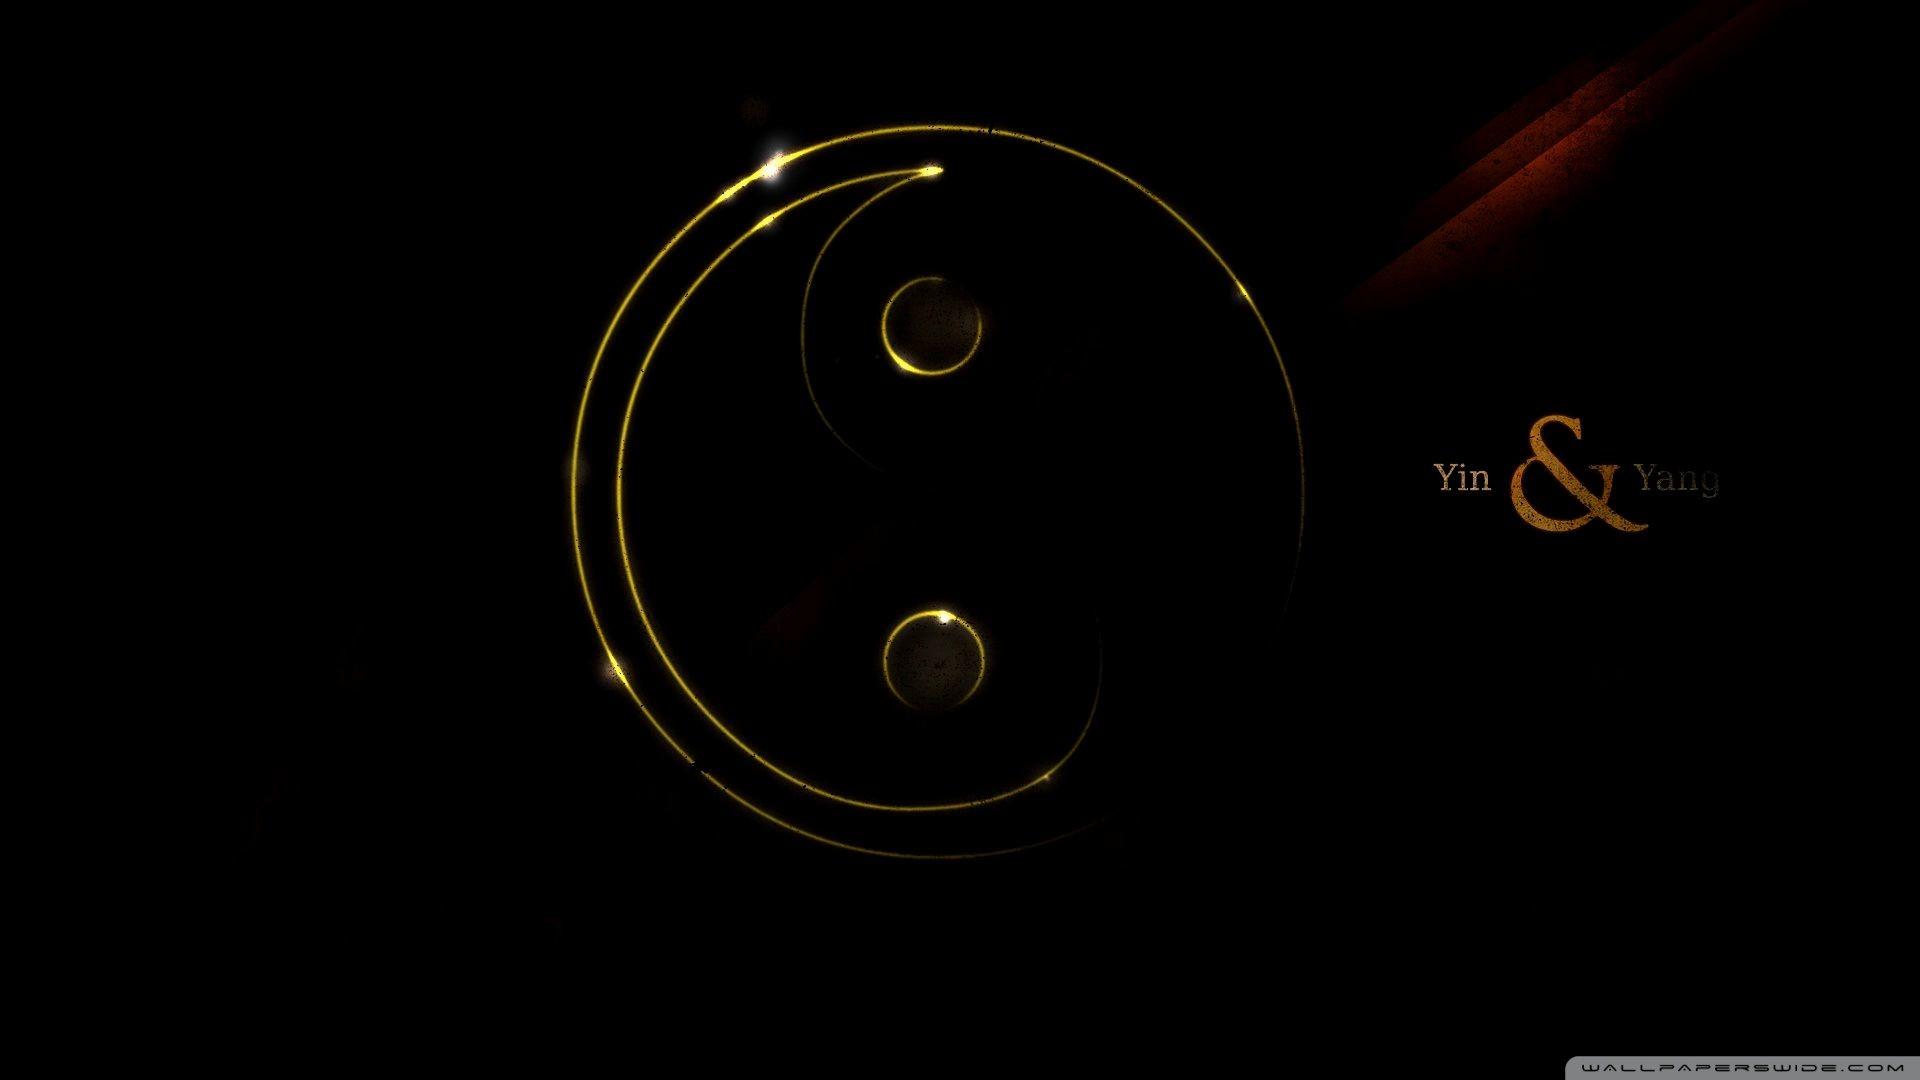 Res: 1920x1080, yin yang wallpaper iphone